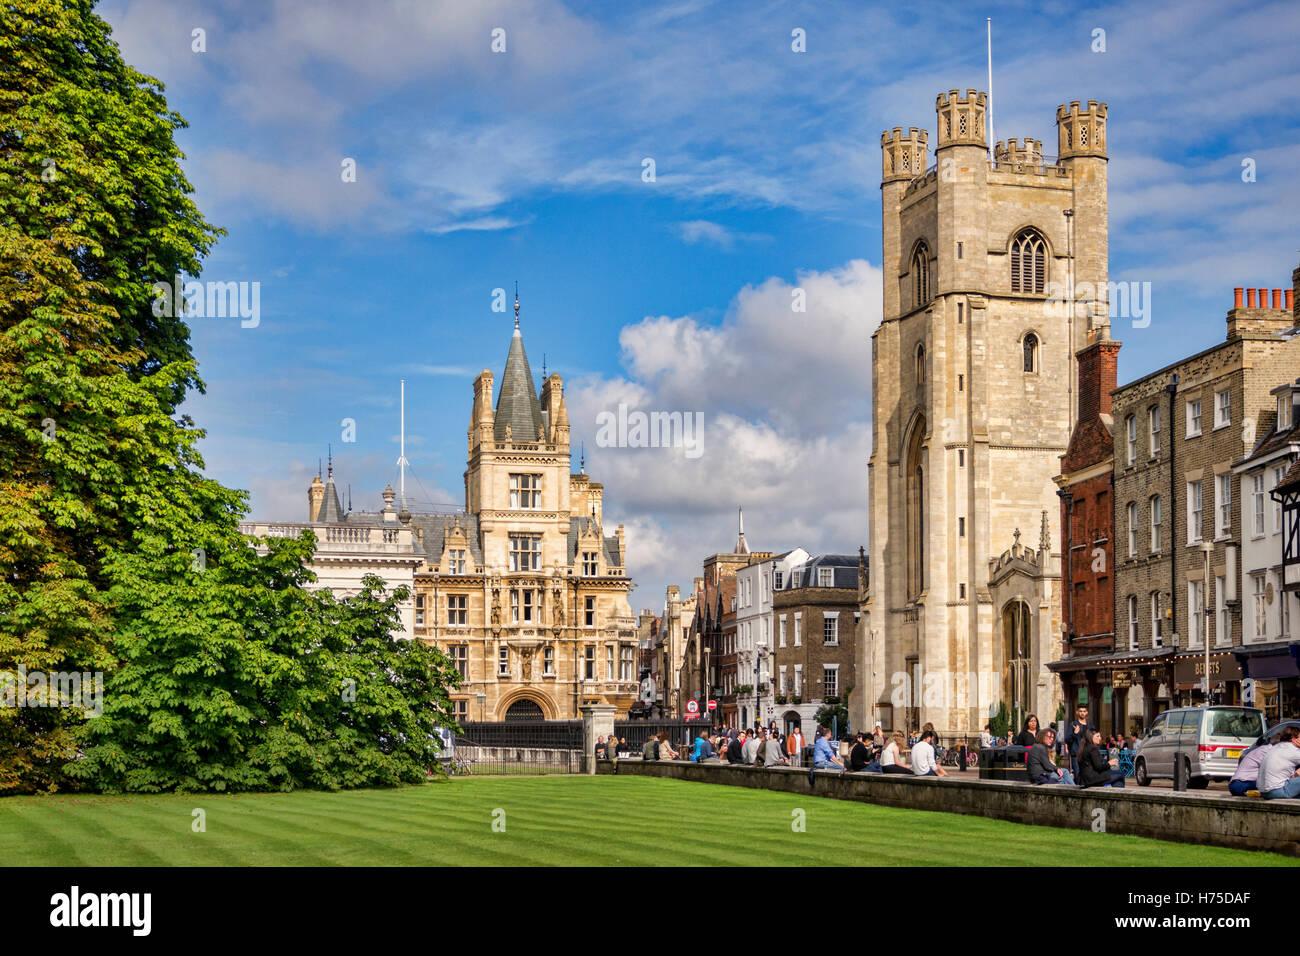 Kings Parade, Cambridge, im Frühherbst. Große Str. Marys Kirche, Trinity College, dem Senat-Haus und Kings College sehen kann Stockfoto